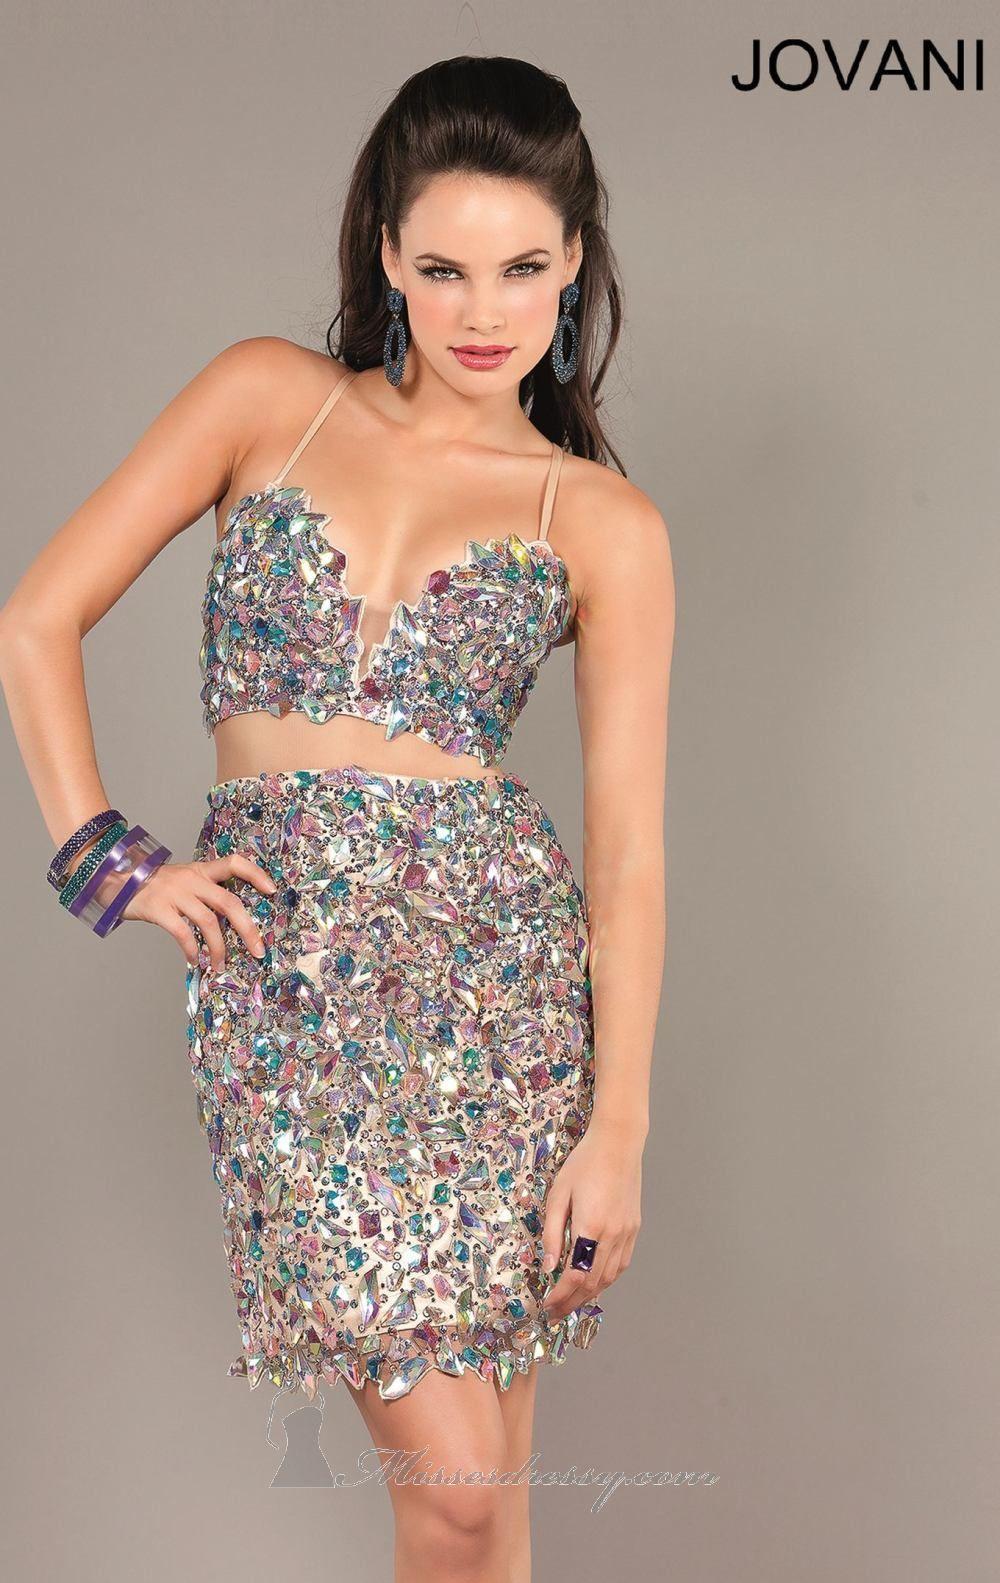 Jovani 2744 Kleid - MissesDressy.de | Extravagant!! | Pinterest